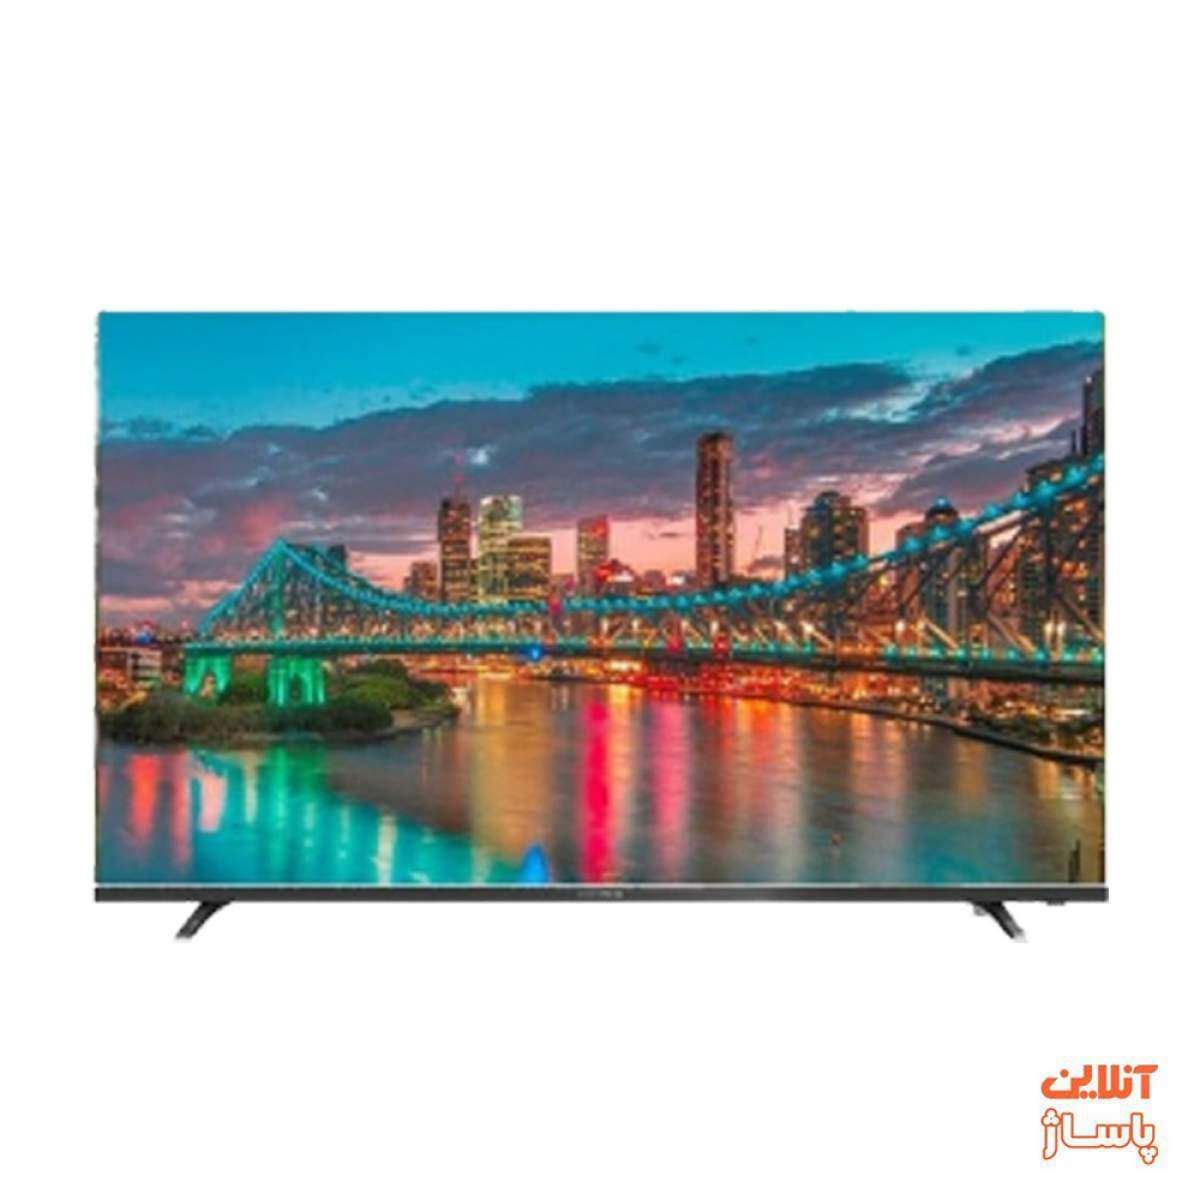 تلویزیون ال ای دی دوو مدل DLE-55H1810U سایز 55 اینچ